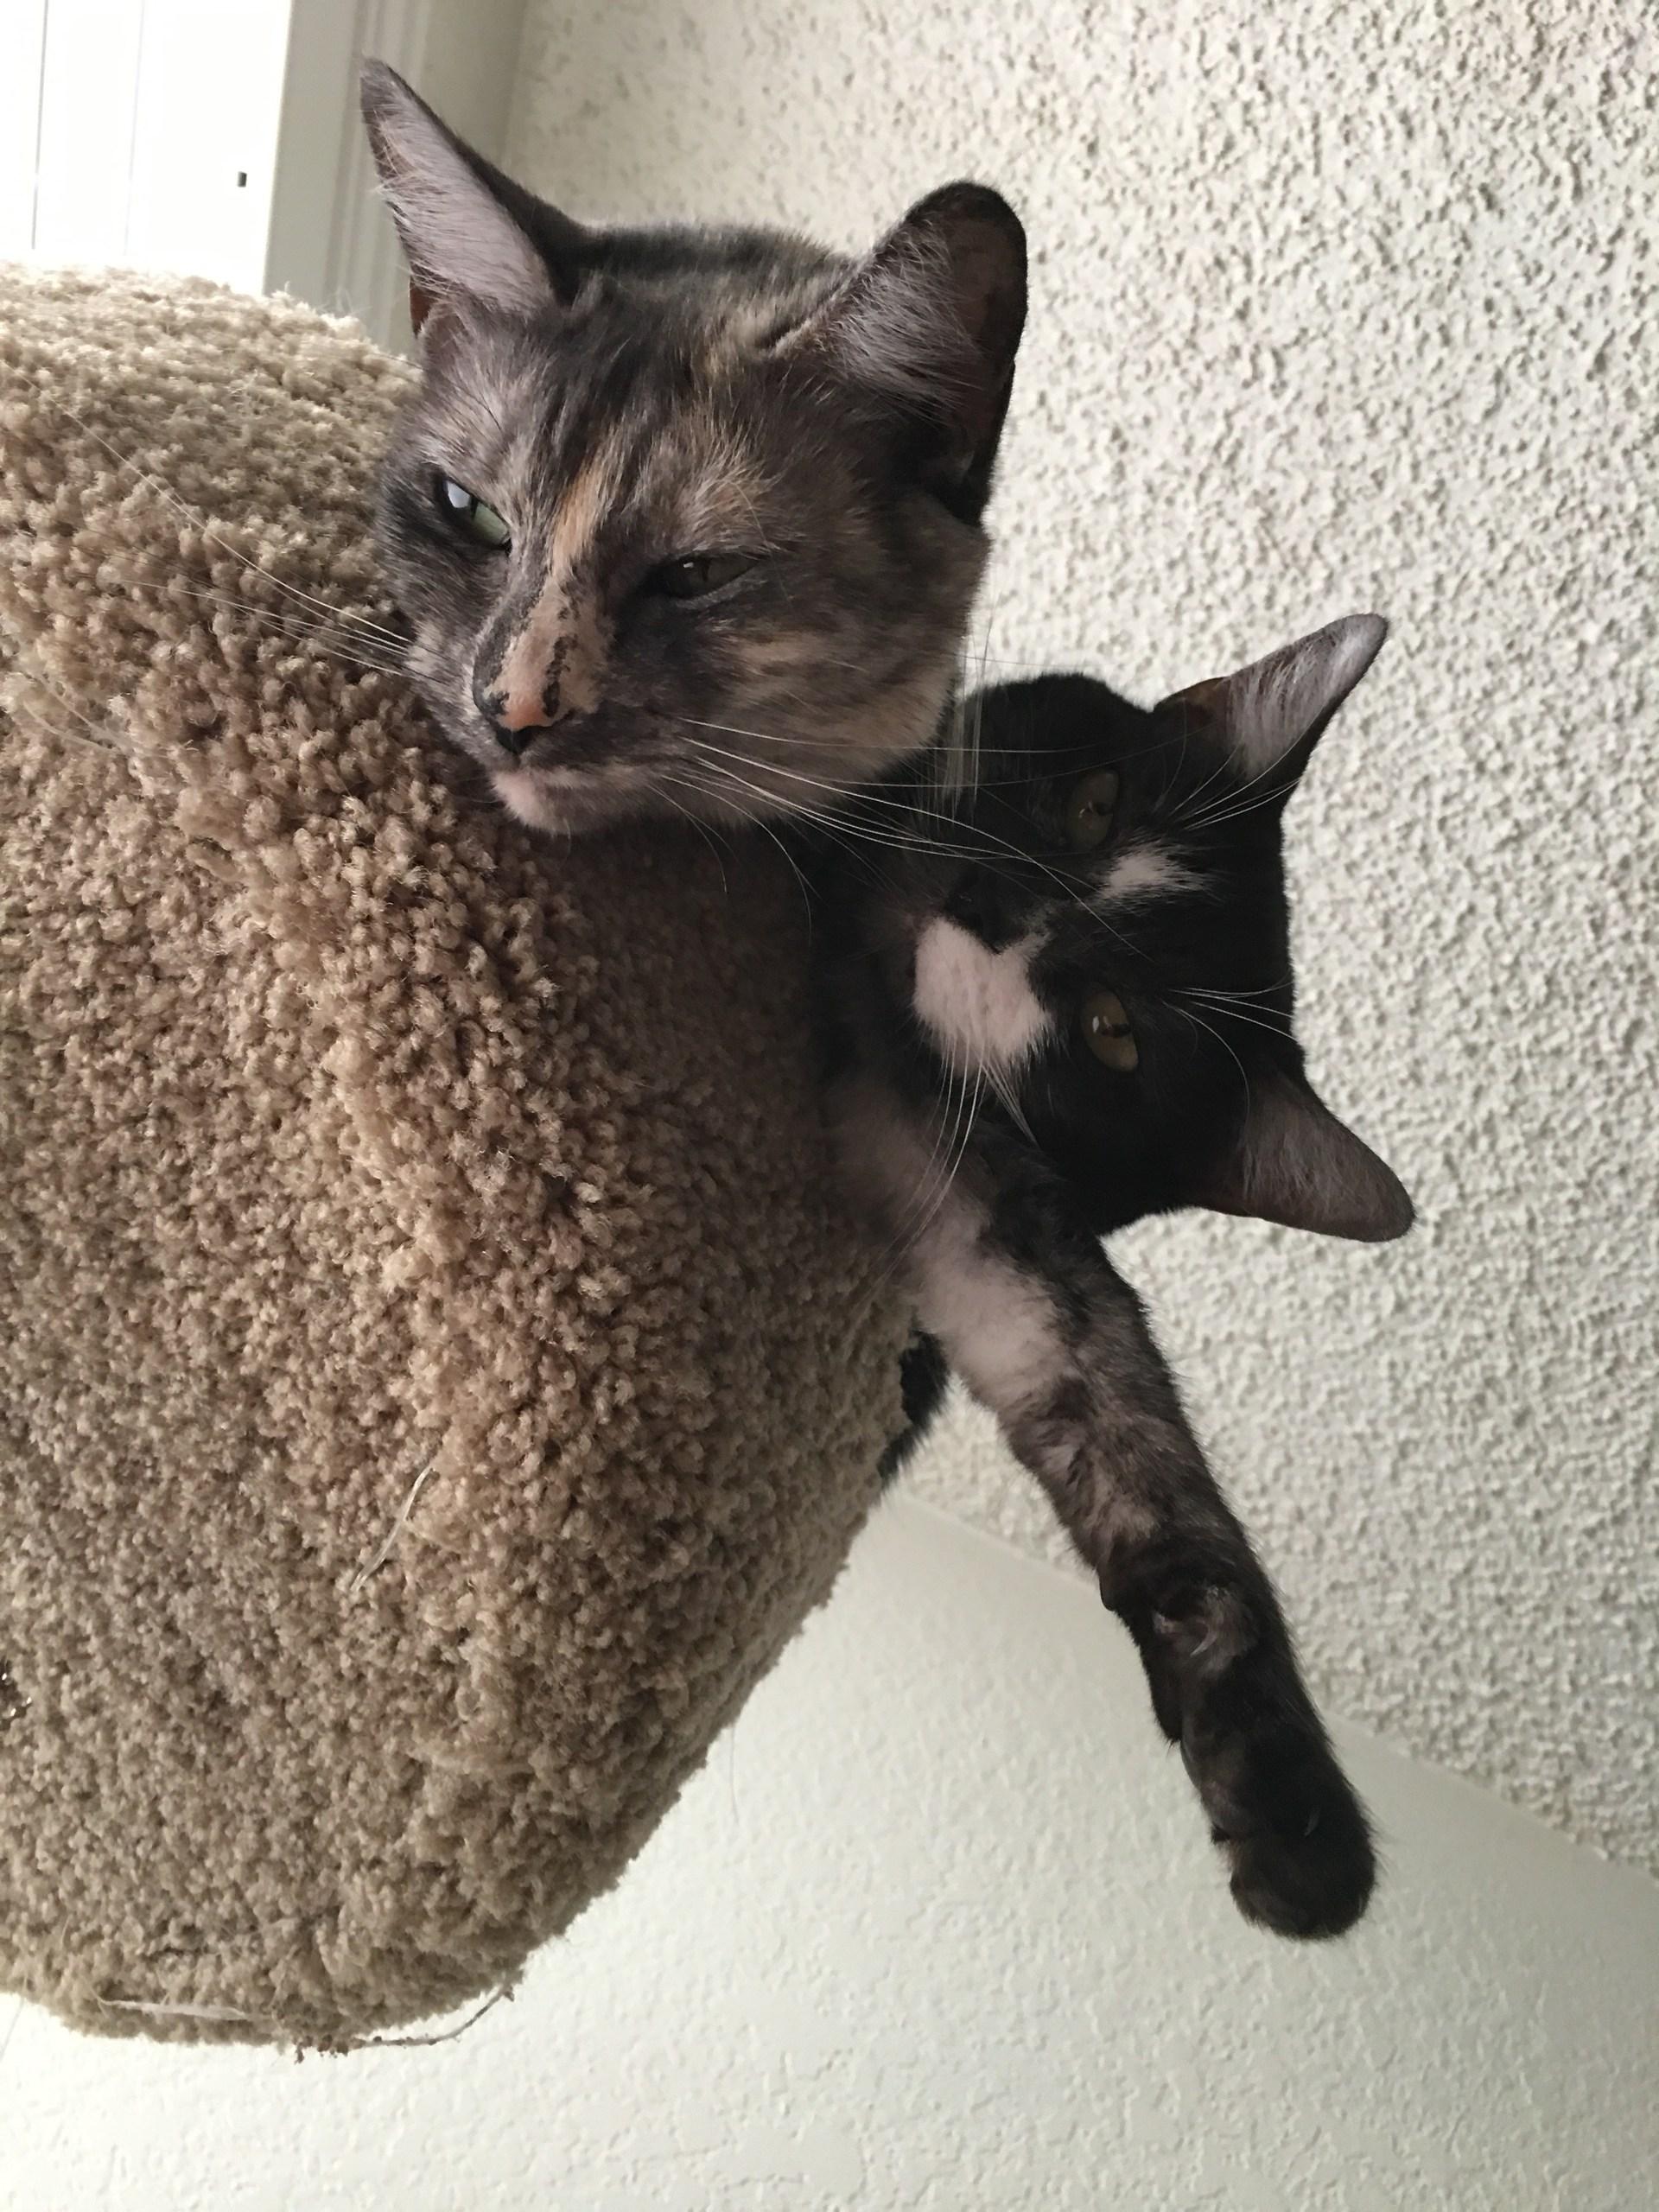 Arya and Athena in their kitty condo.